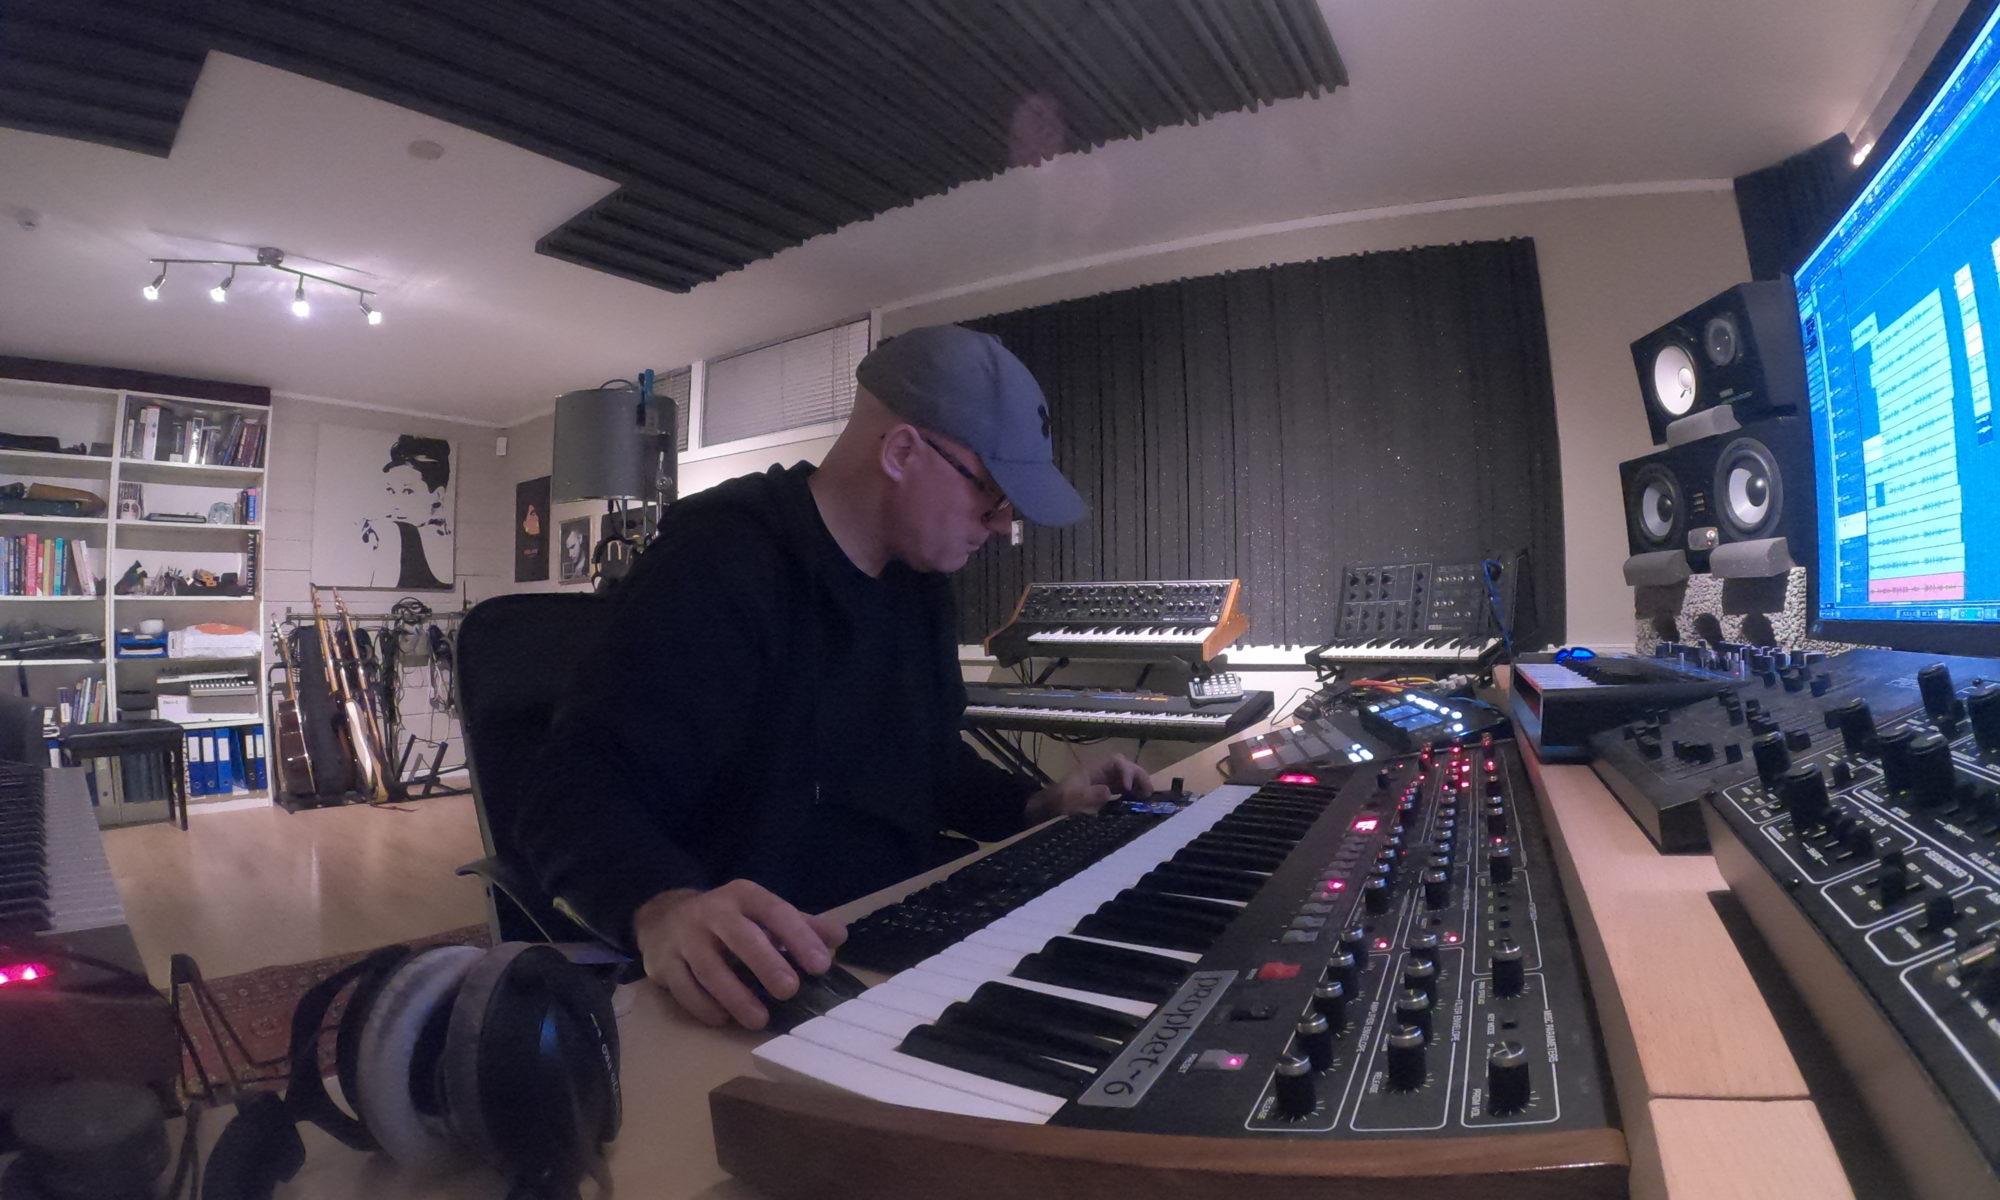 Simon Field Inspiration Studio and DJ